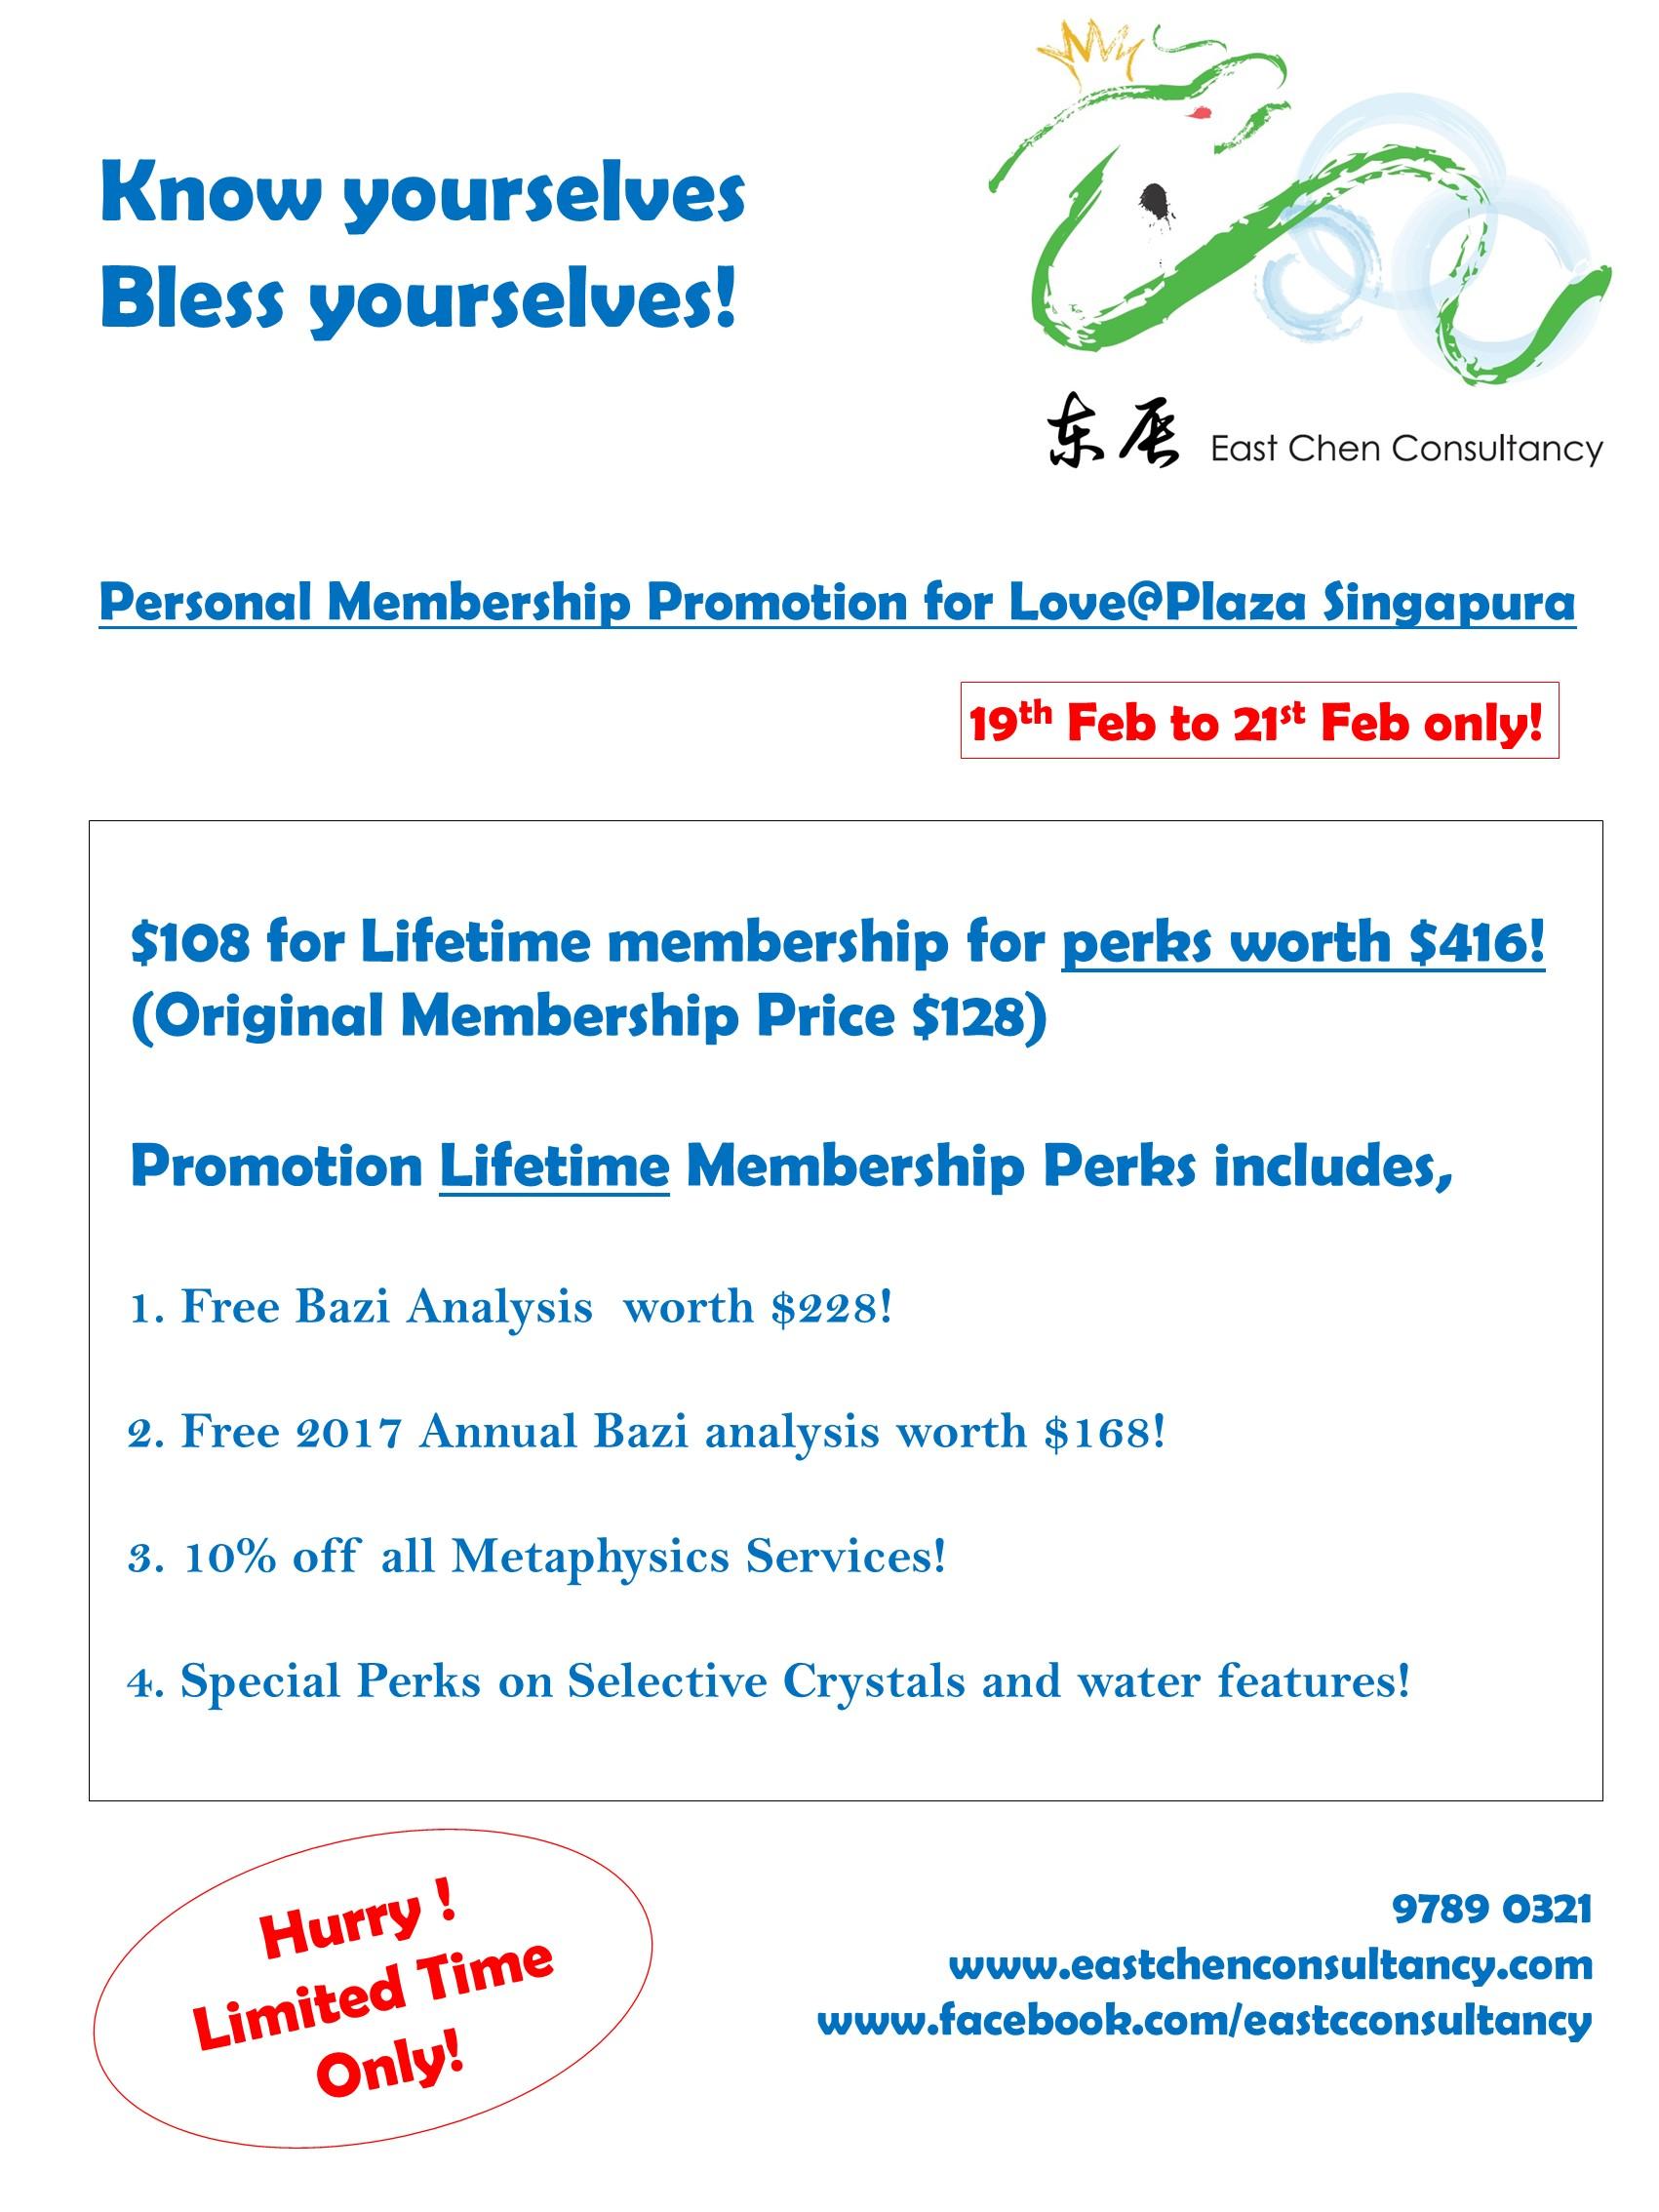 Love@Plaza Singapura Membership Promotions | East Chen